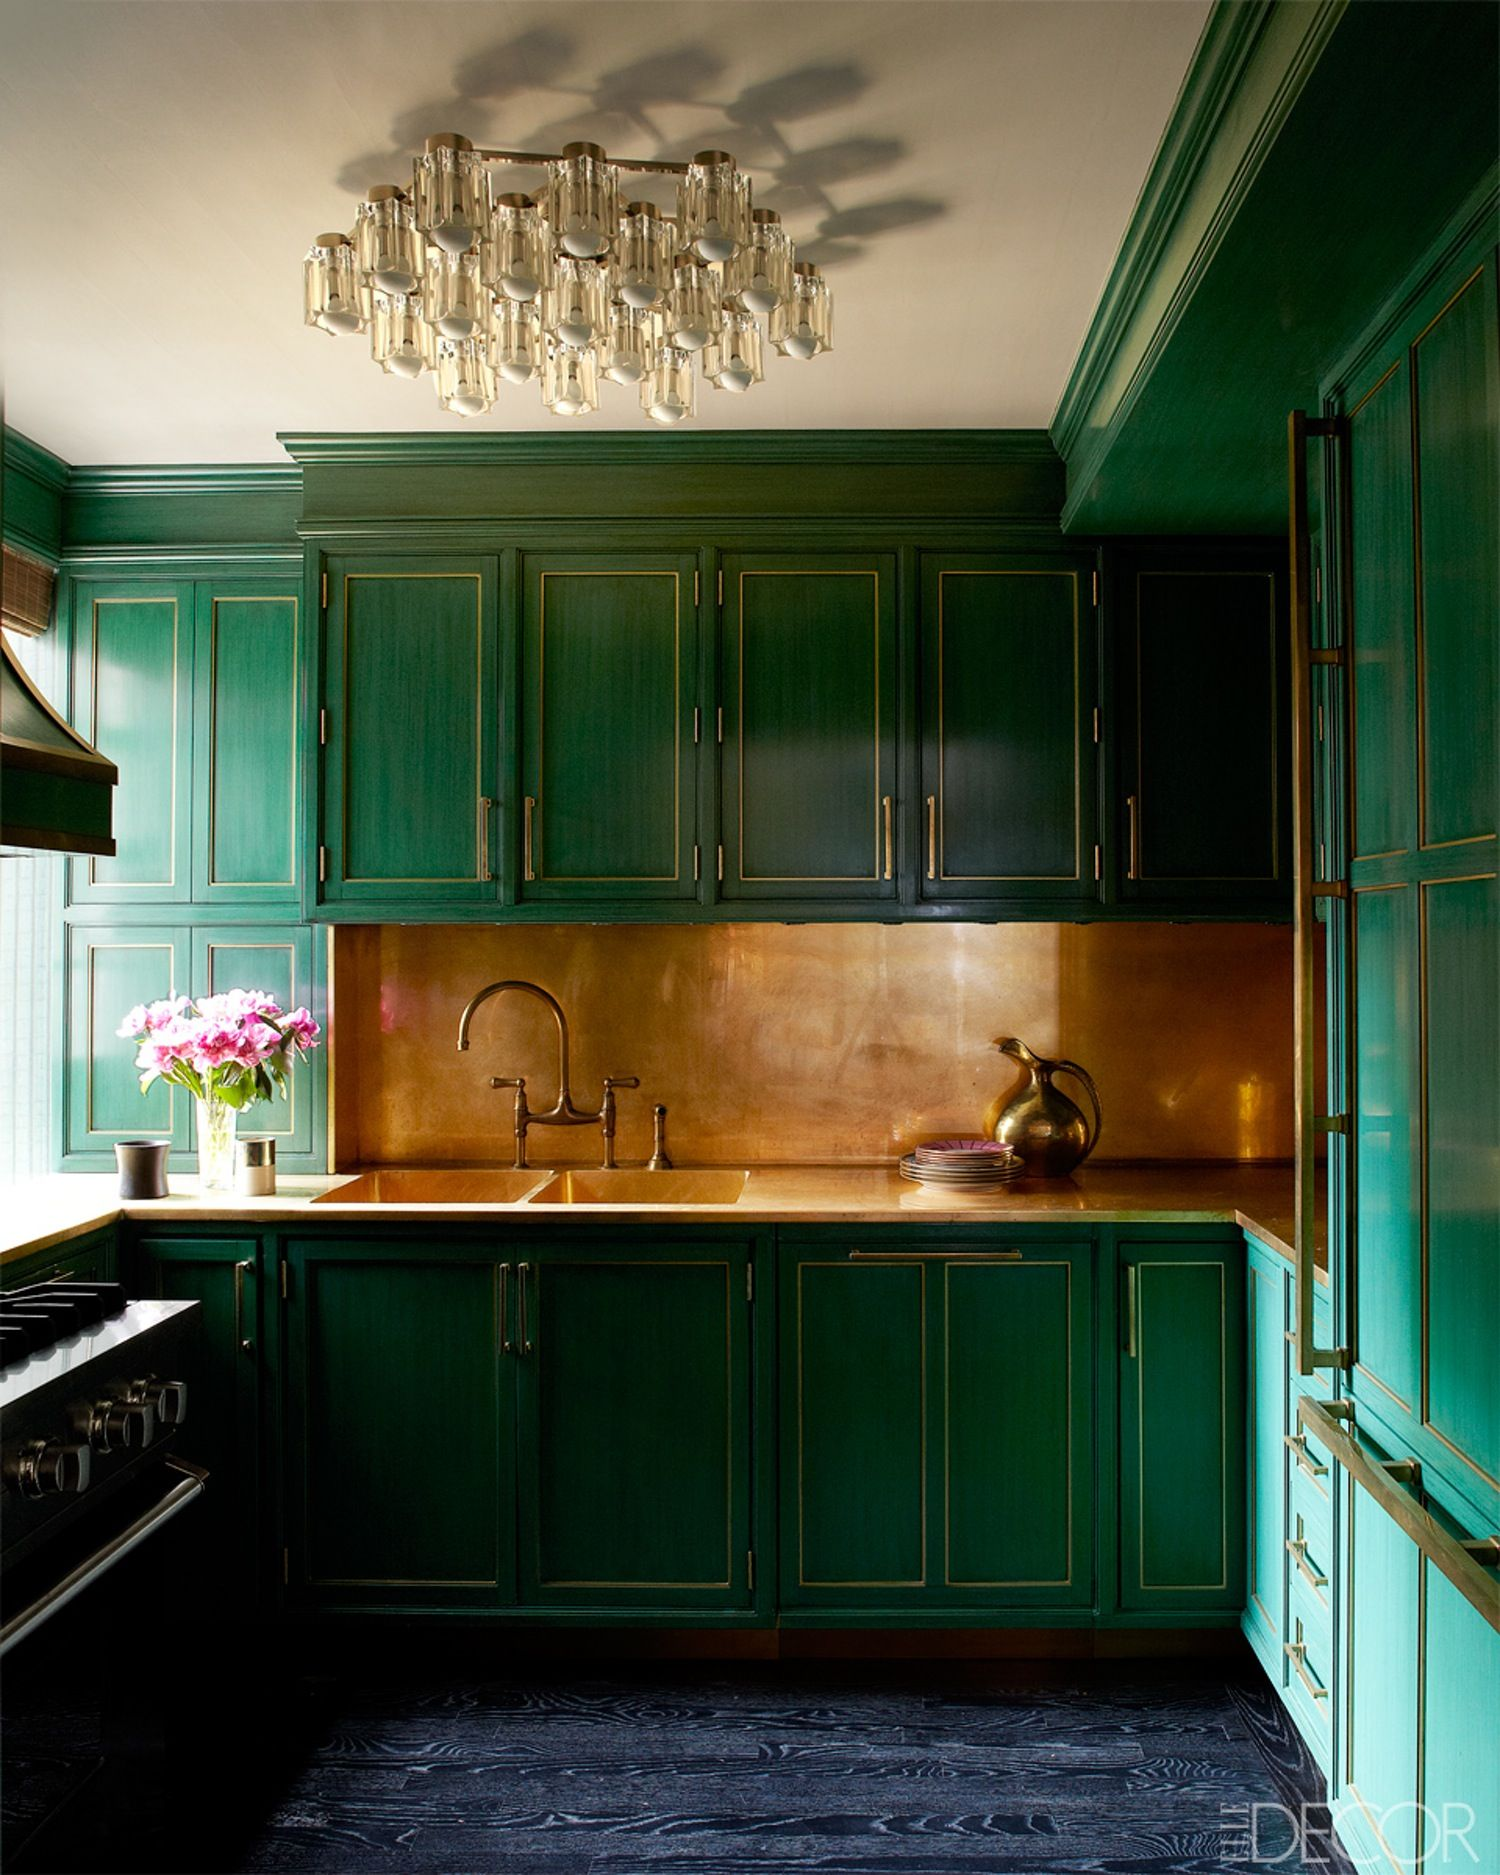 Cameron Diaz s Manhattan Kitchen Is a Gorgeous Little Jewel Box